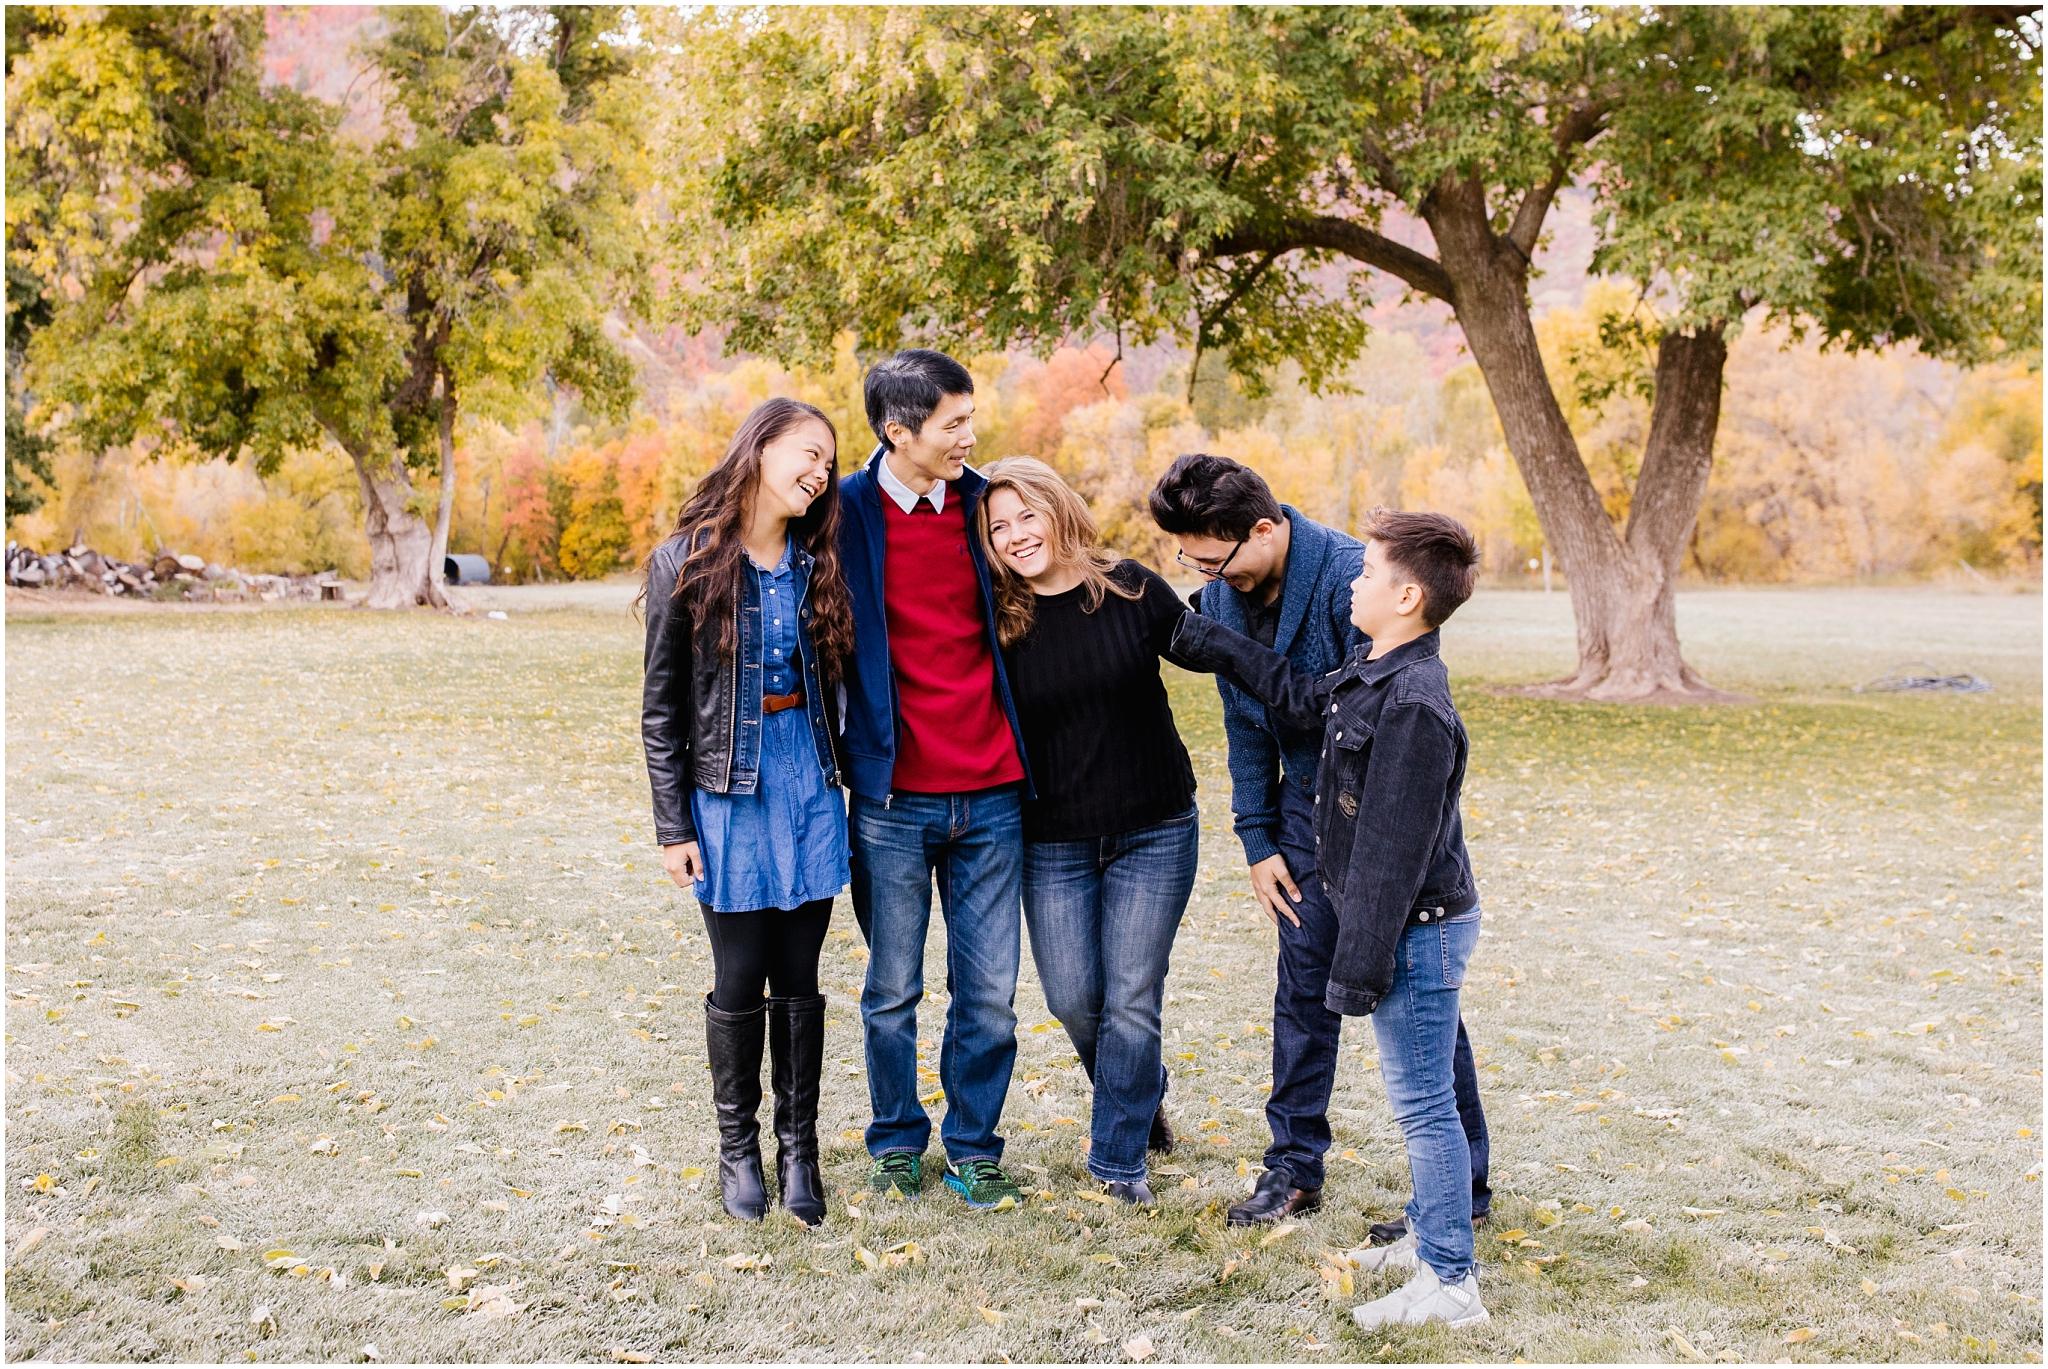 Qian-23_Lizzie-B-Imagery-Utah-Family-Photographer-Salt-Lake-City-Park-City-Utah-County-Hobble-Creek-Canyon-Jolleys-Ranch.jpg